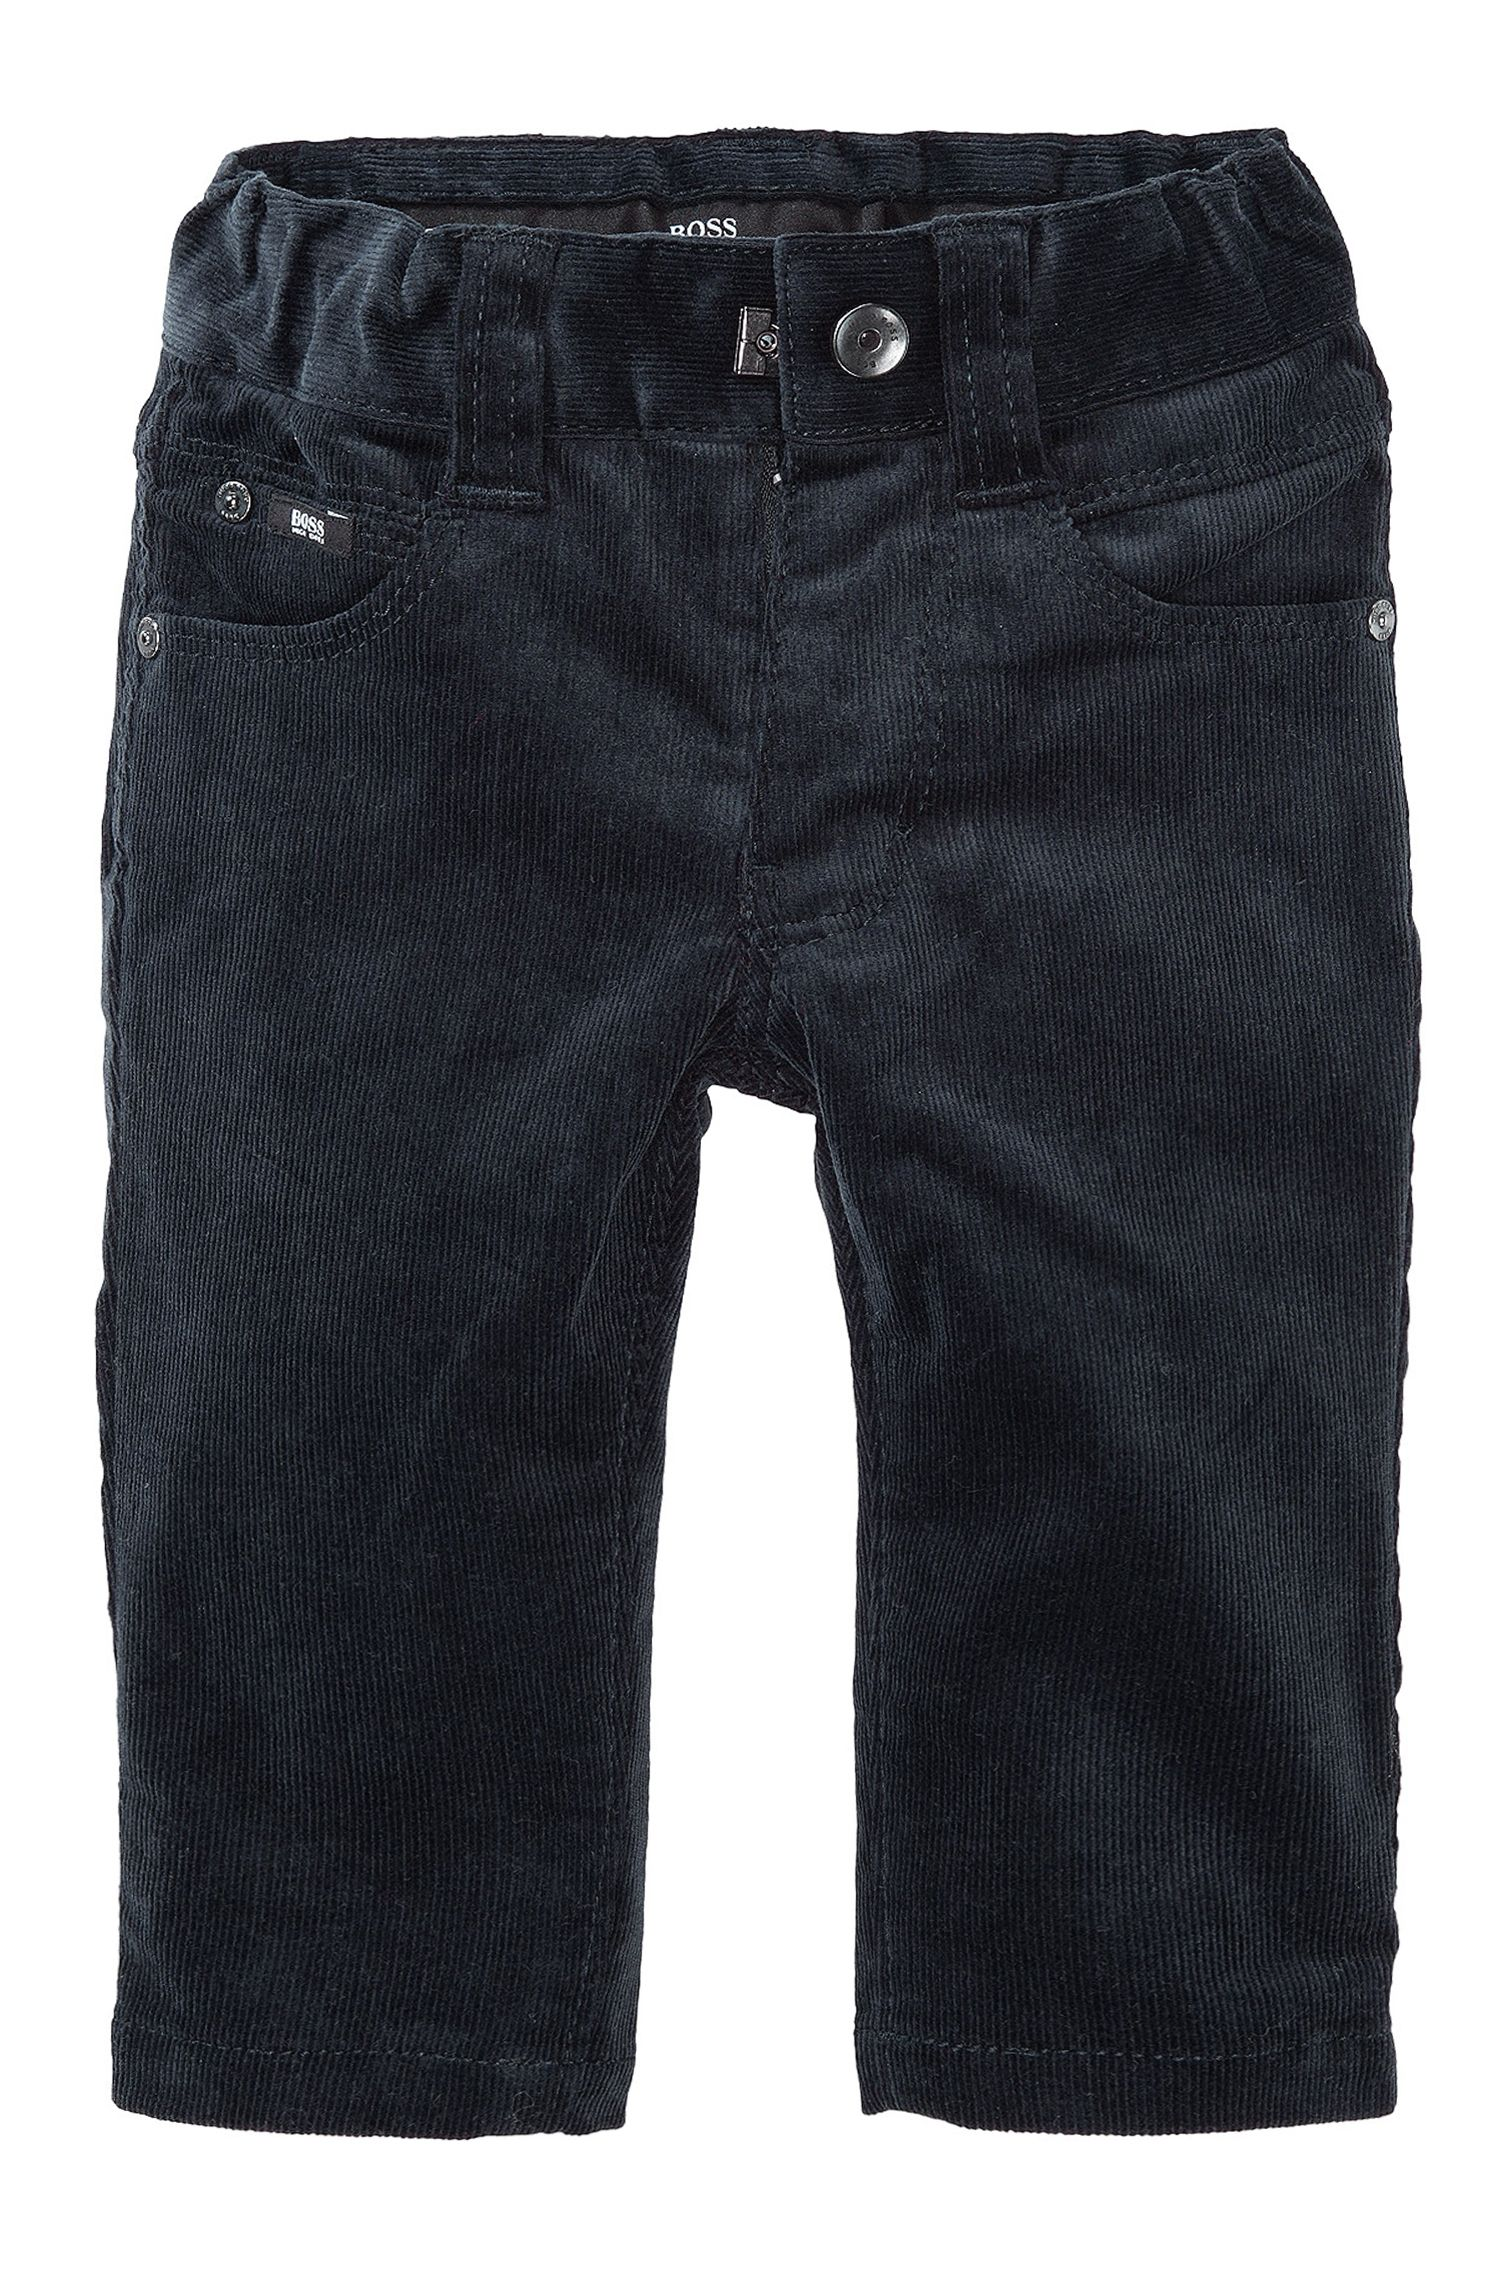 'J04124' | Toddler Stretch Cotton Corduroy Chinos